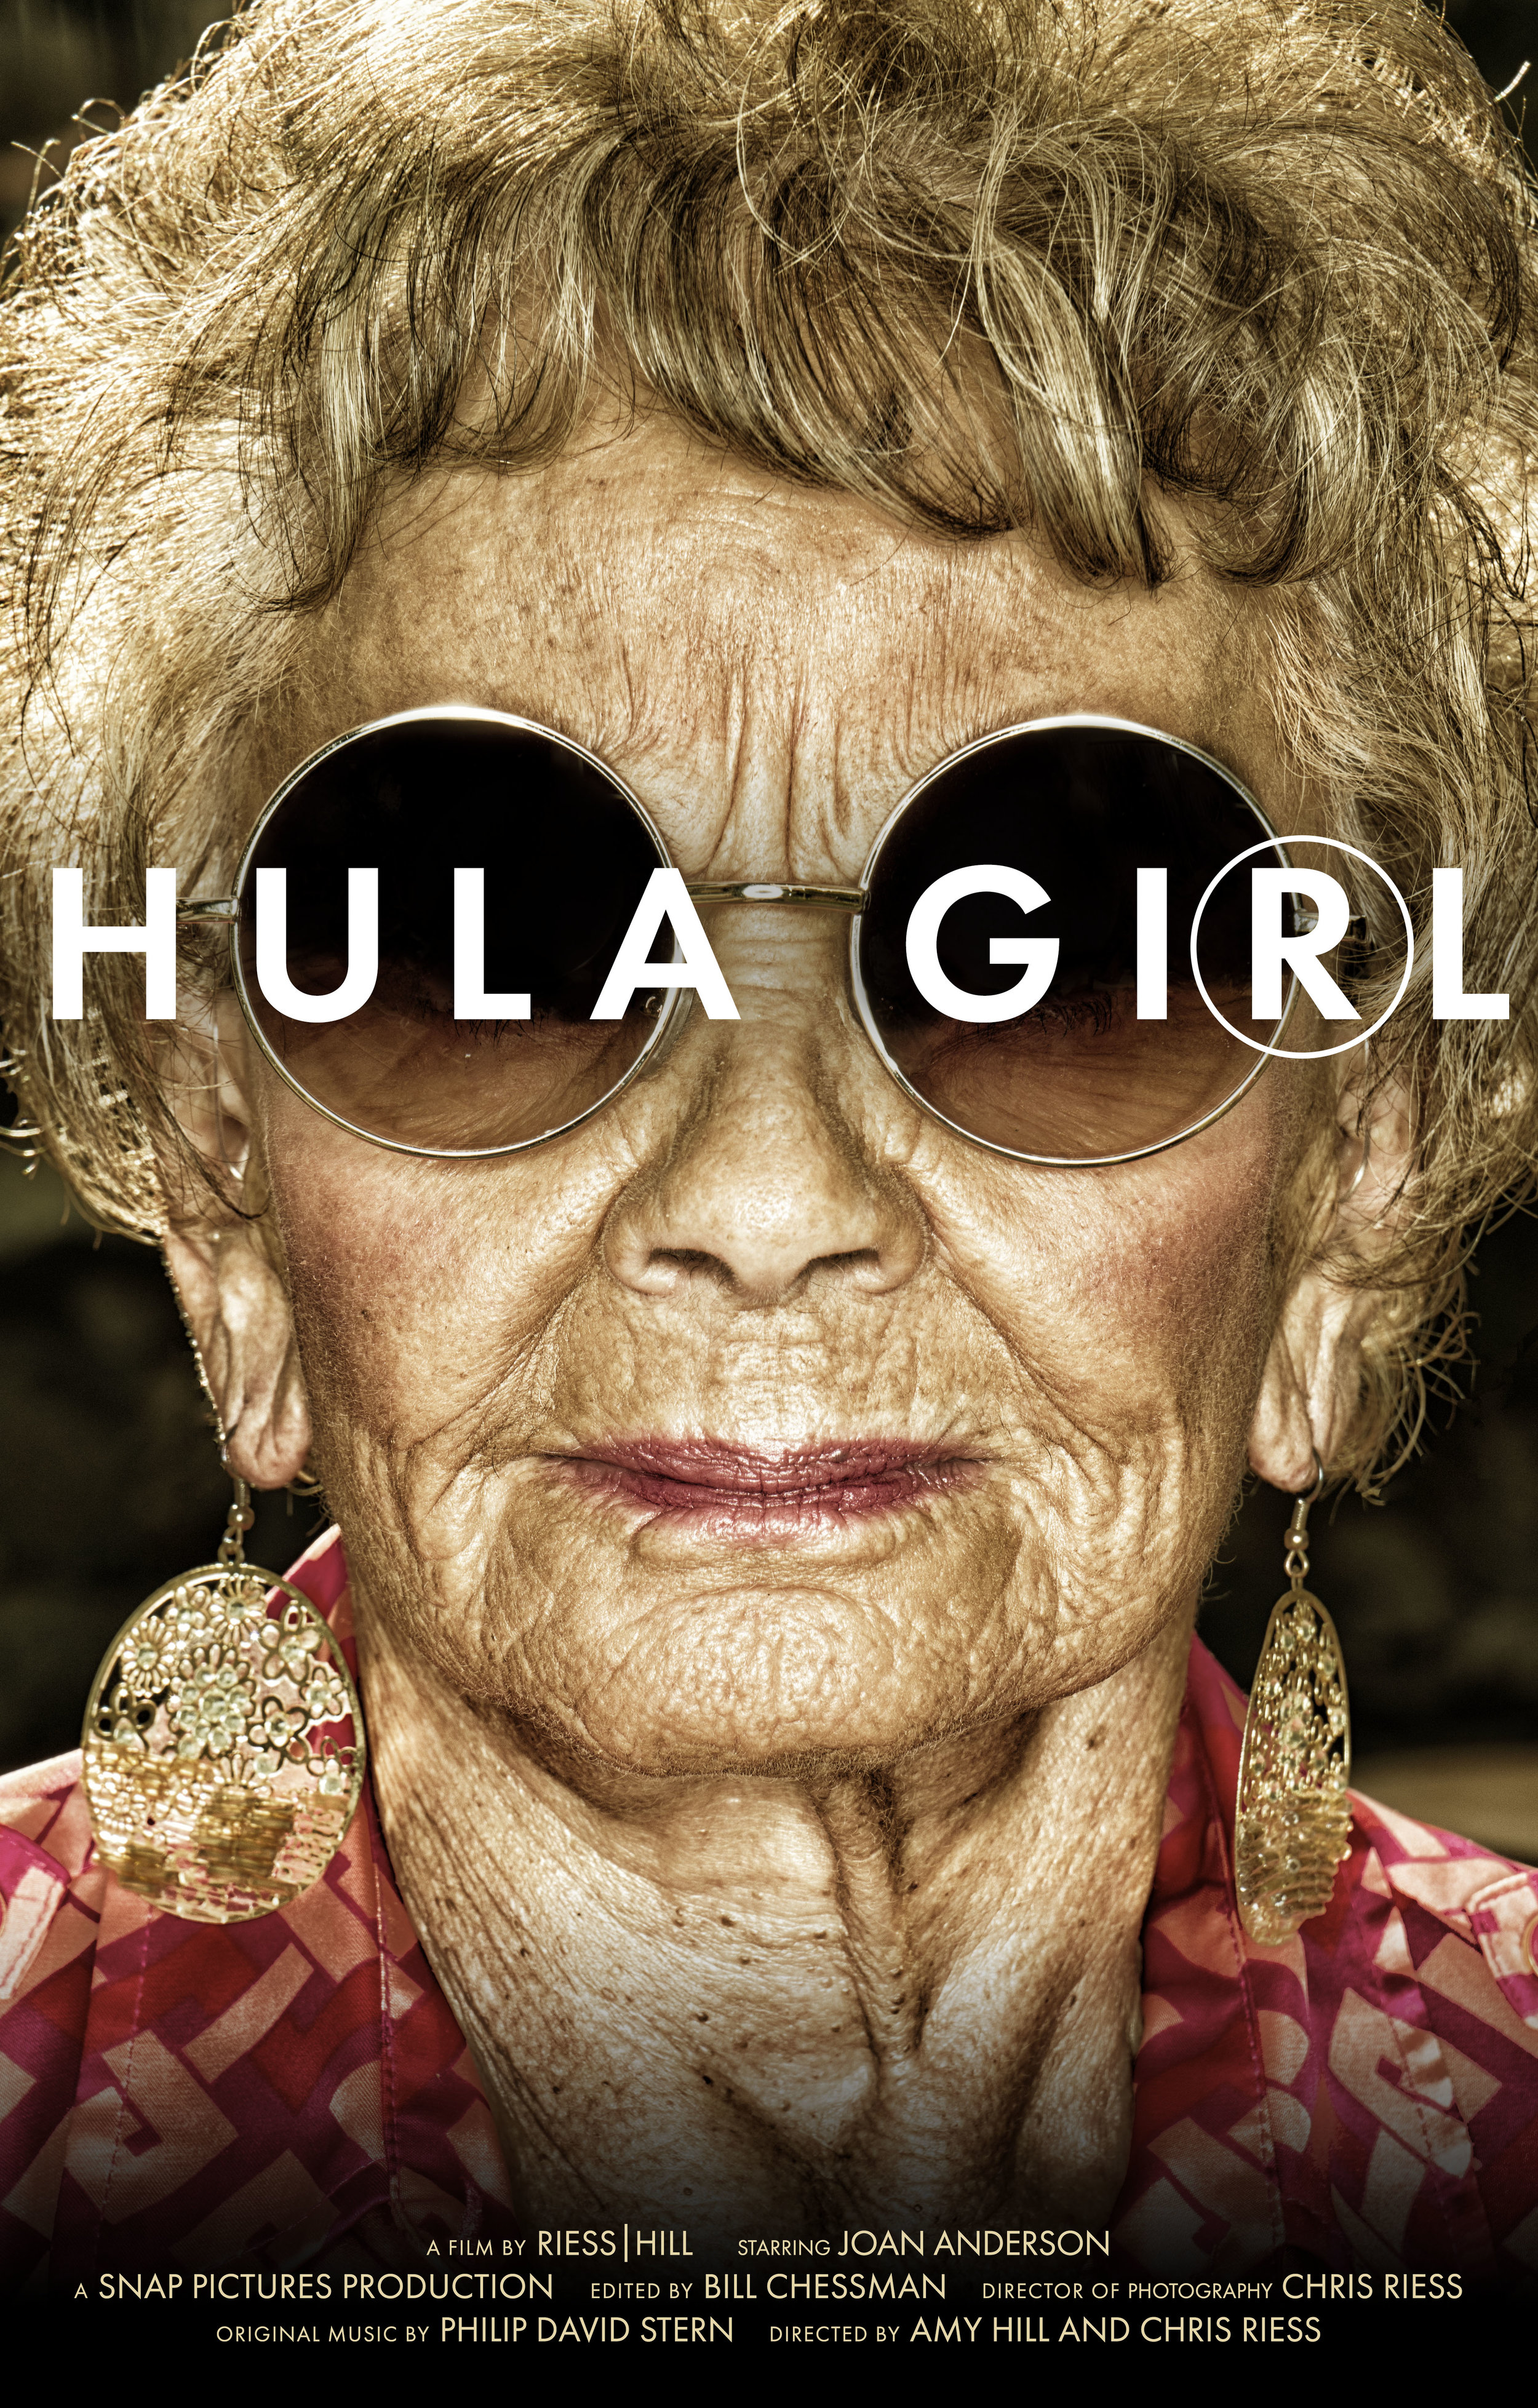 HulaGirl-Poster-Compressed.jpg